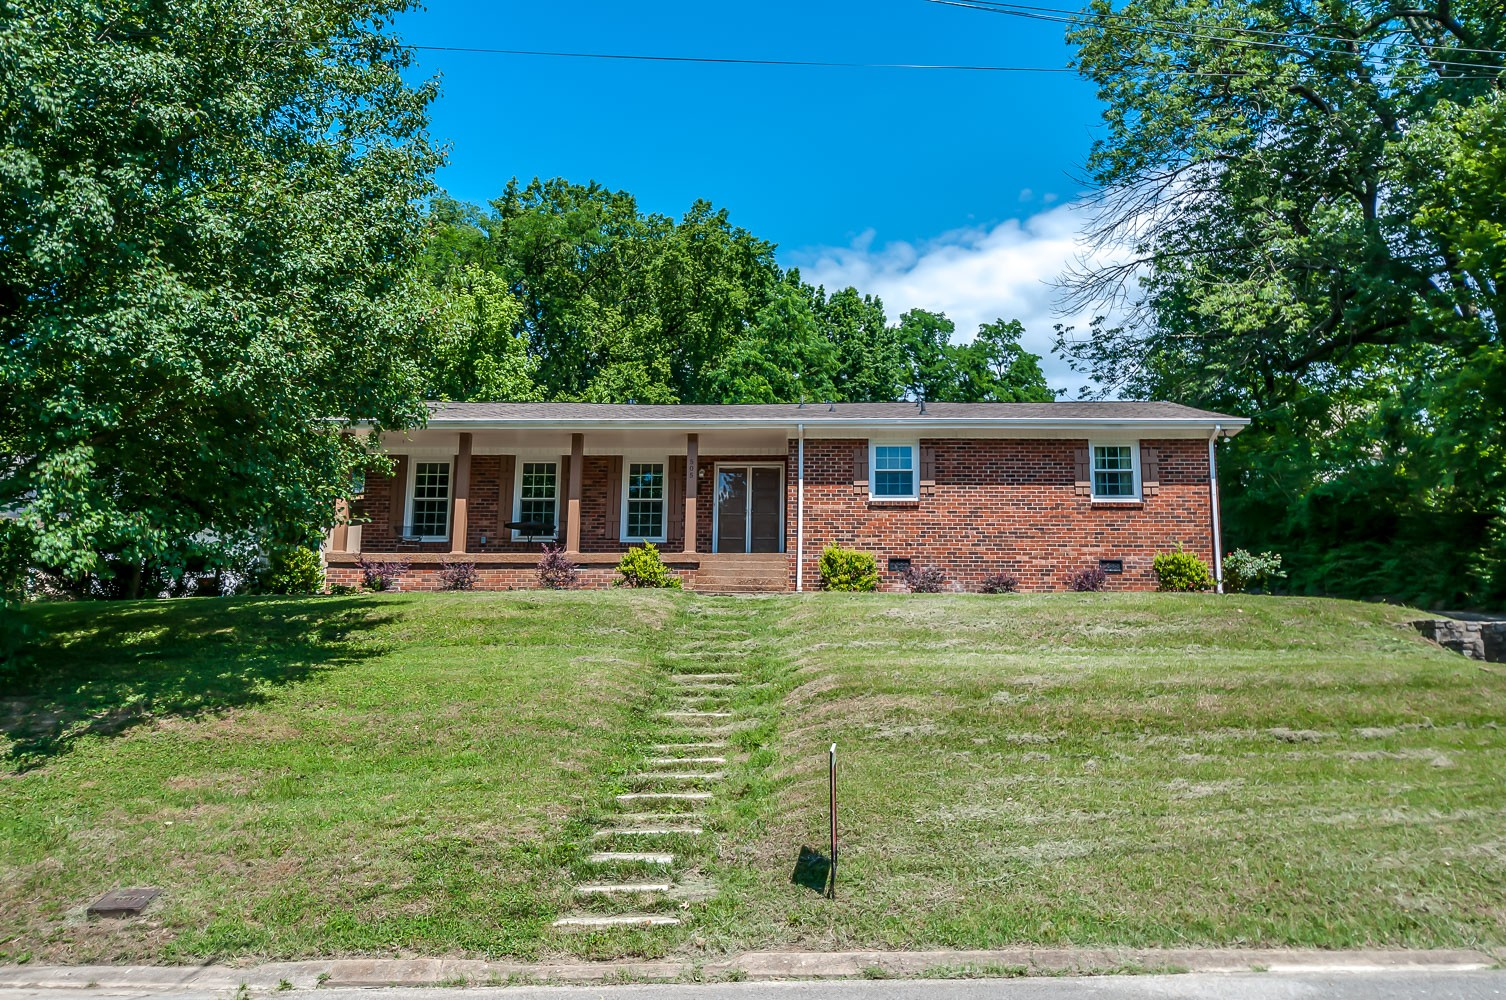 505 Shady Oak Dr Property Photo - Nashville, TN real estate listing